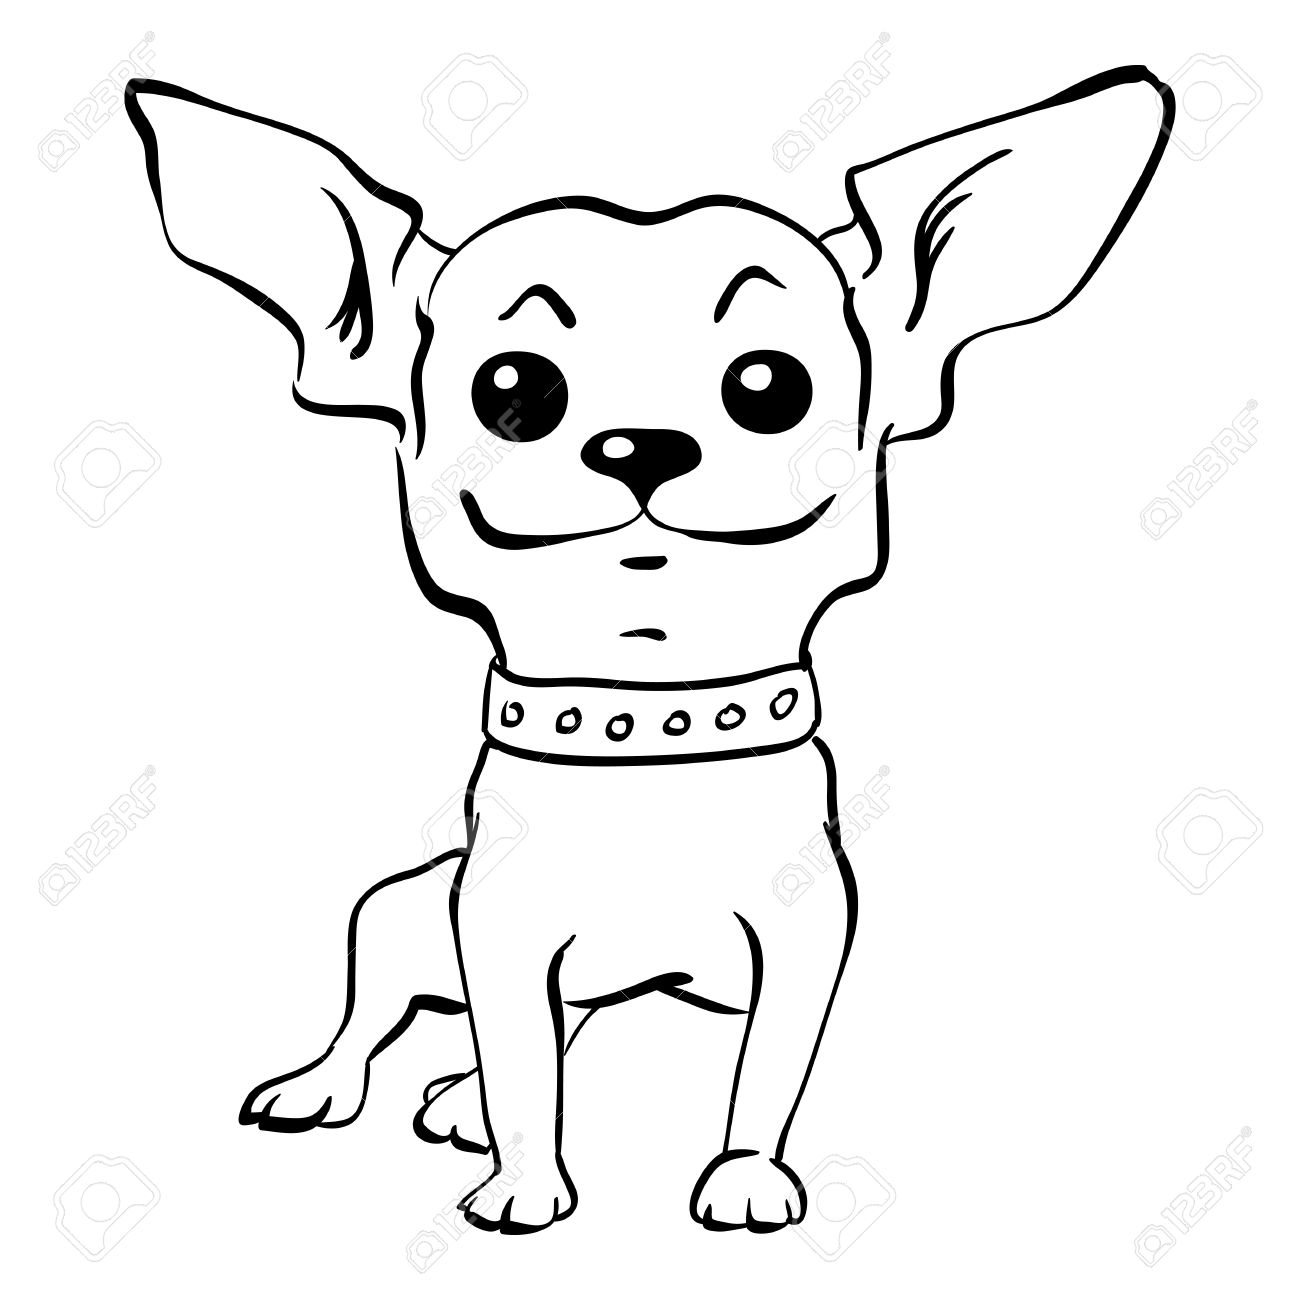 funny dog drawing